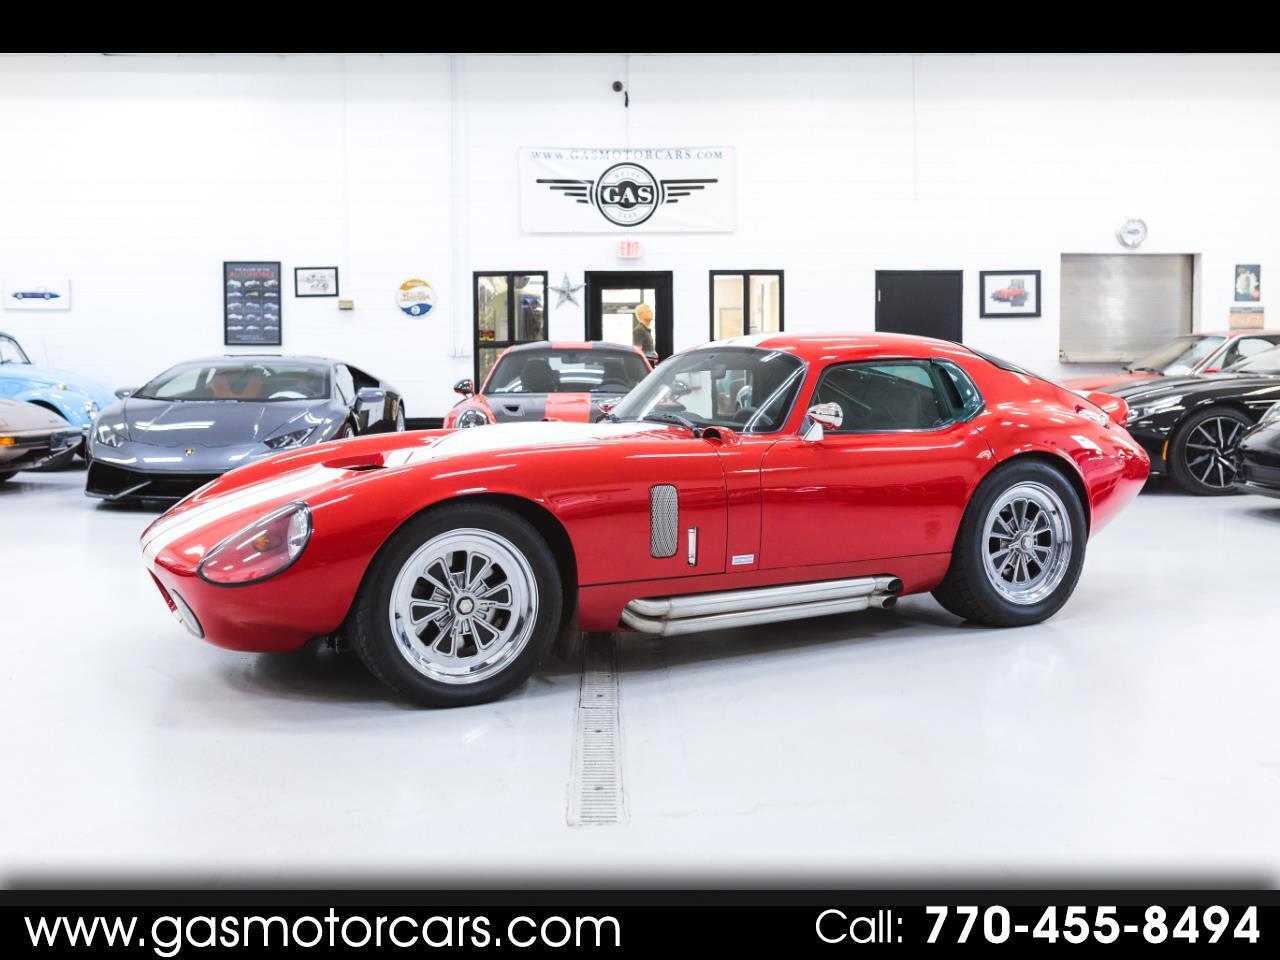 1964 Superformance Daytona